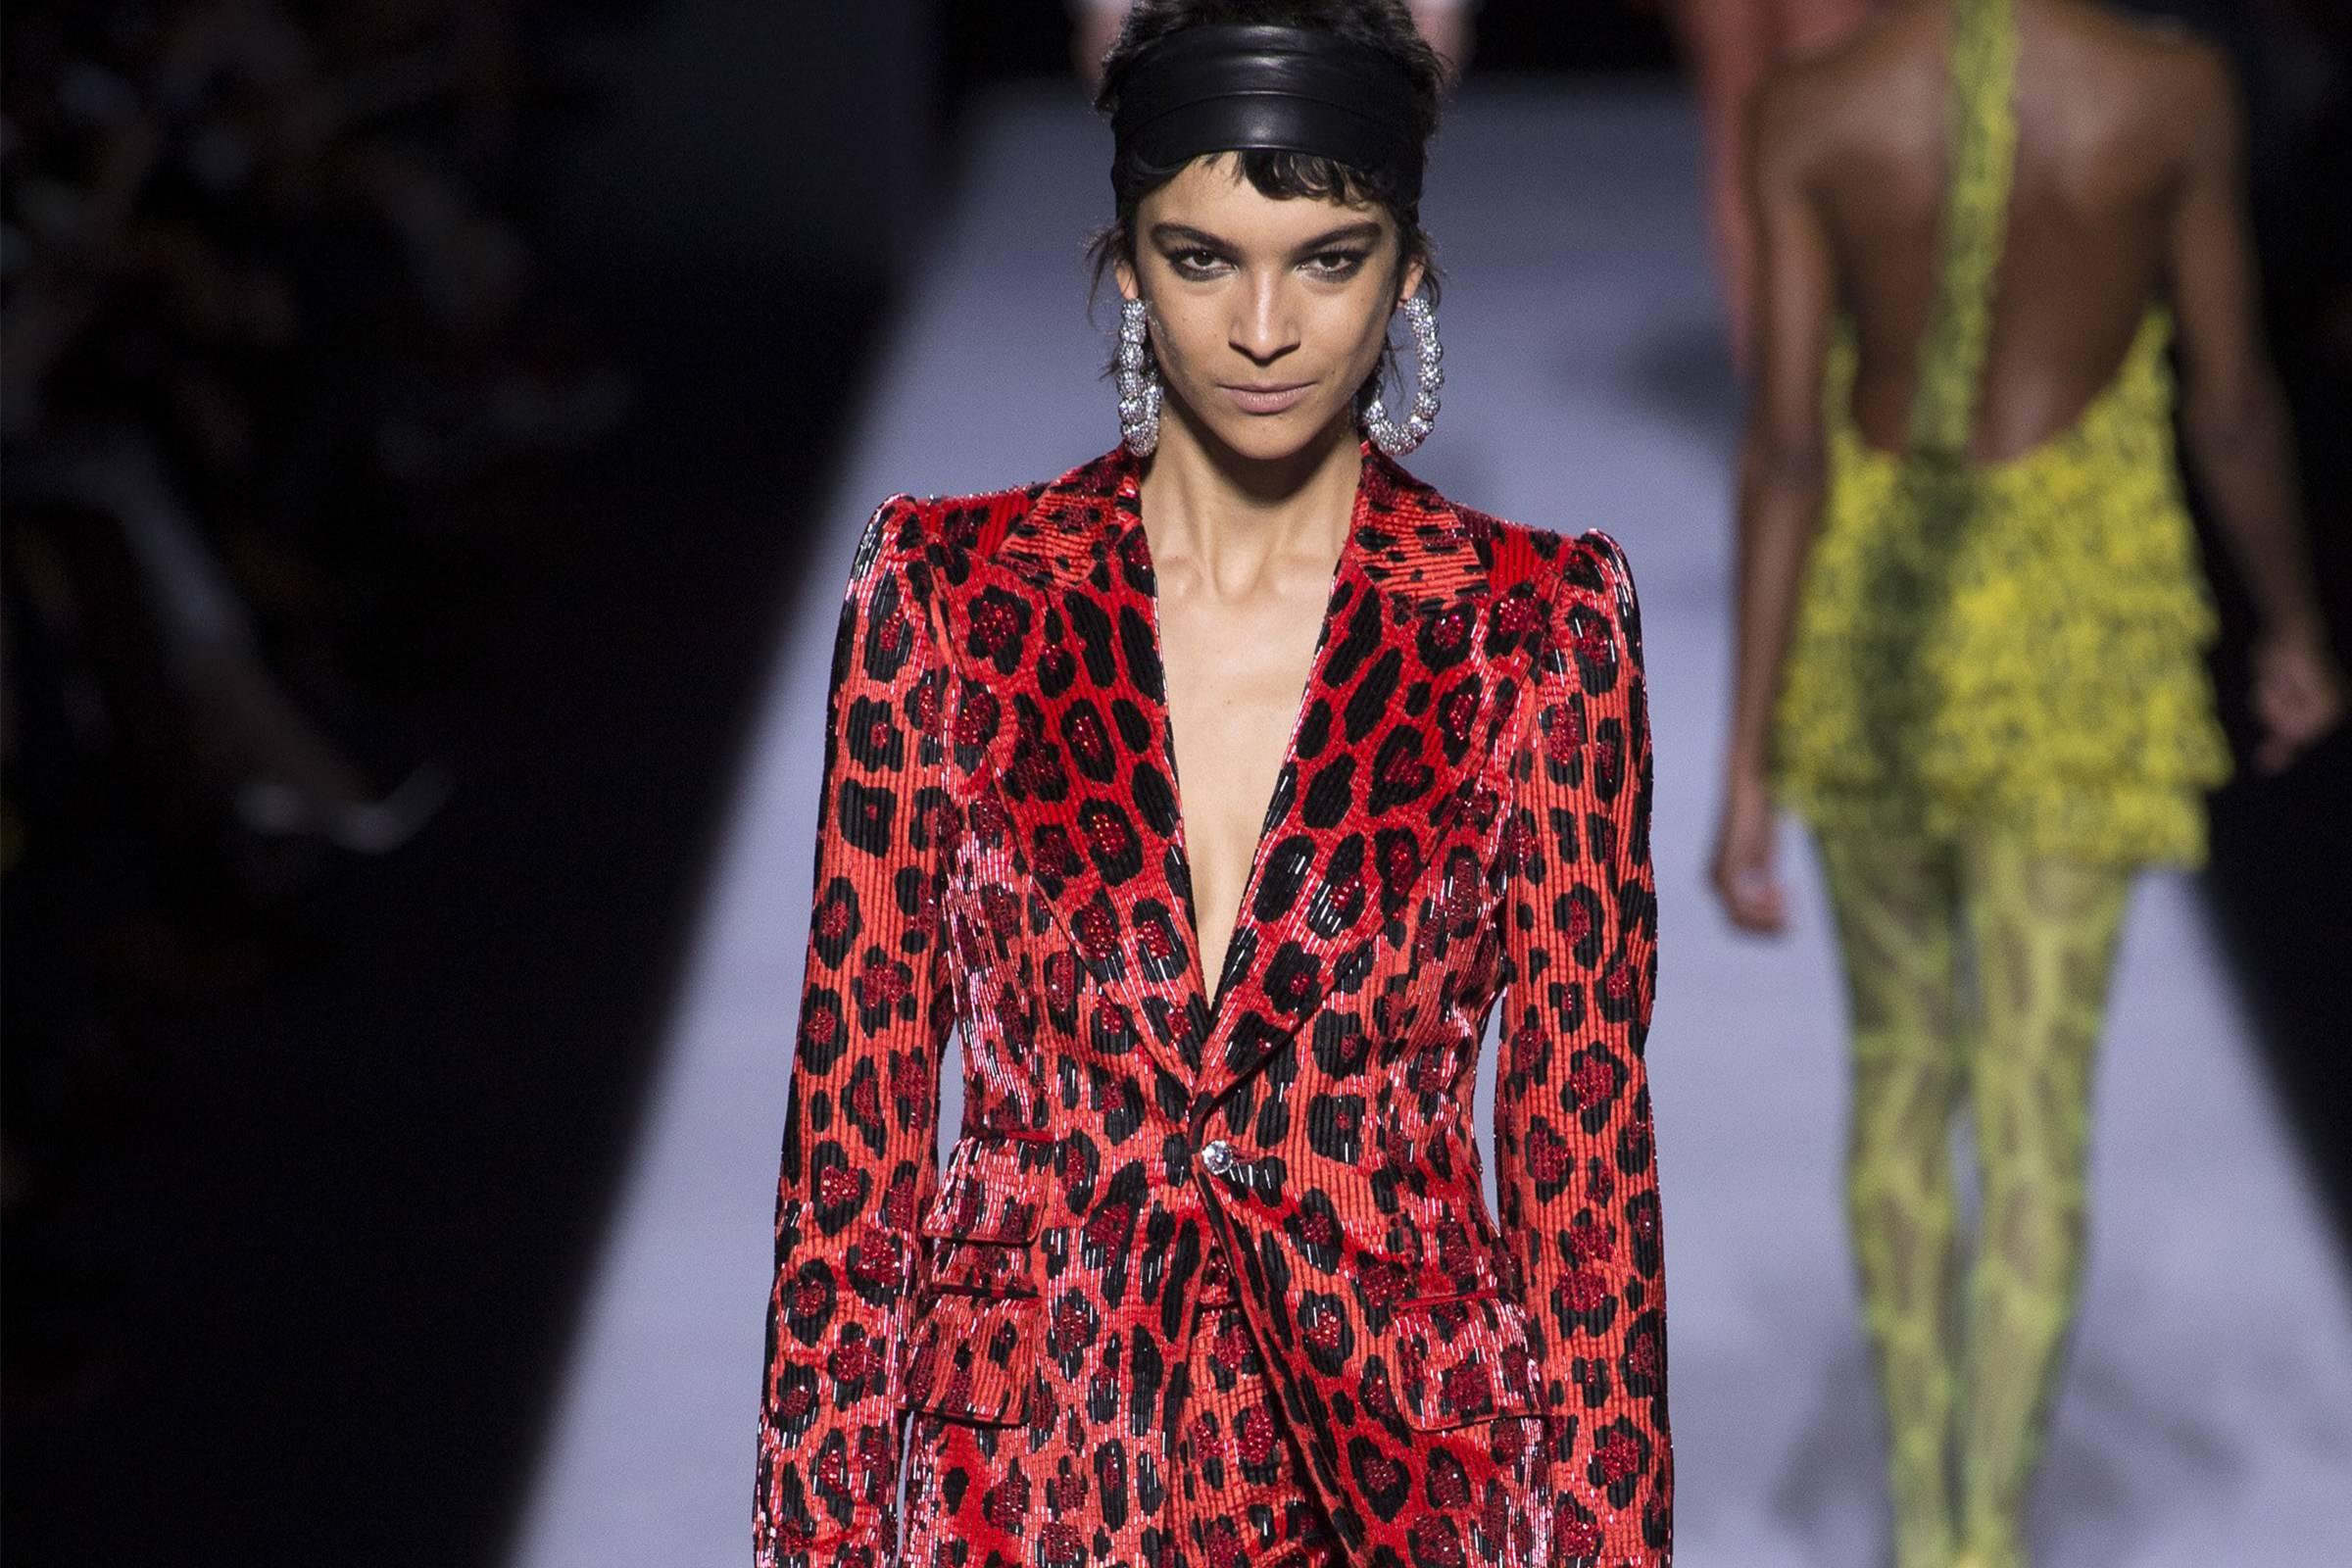 Heroine: The Dangerously Seductive Power of Leopard Print